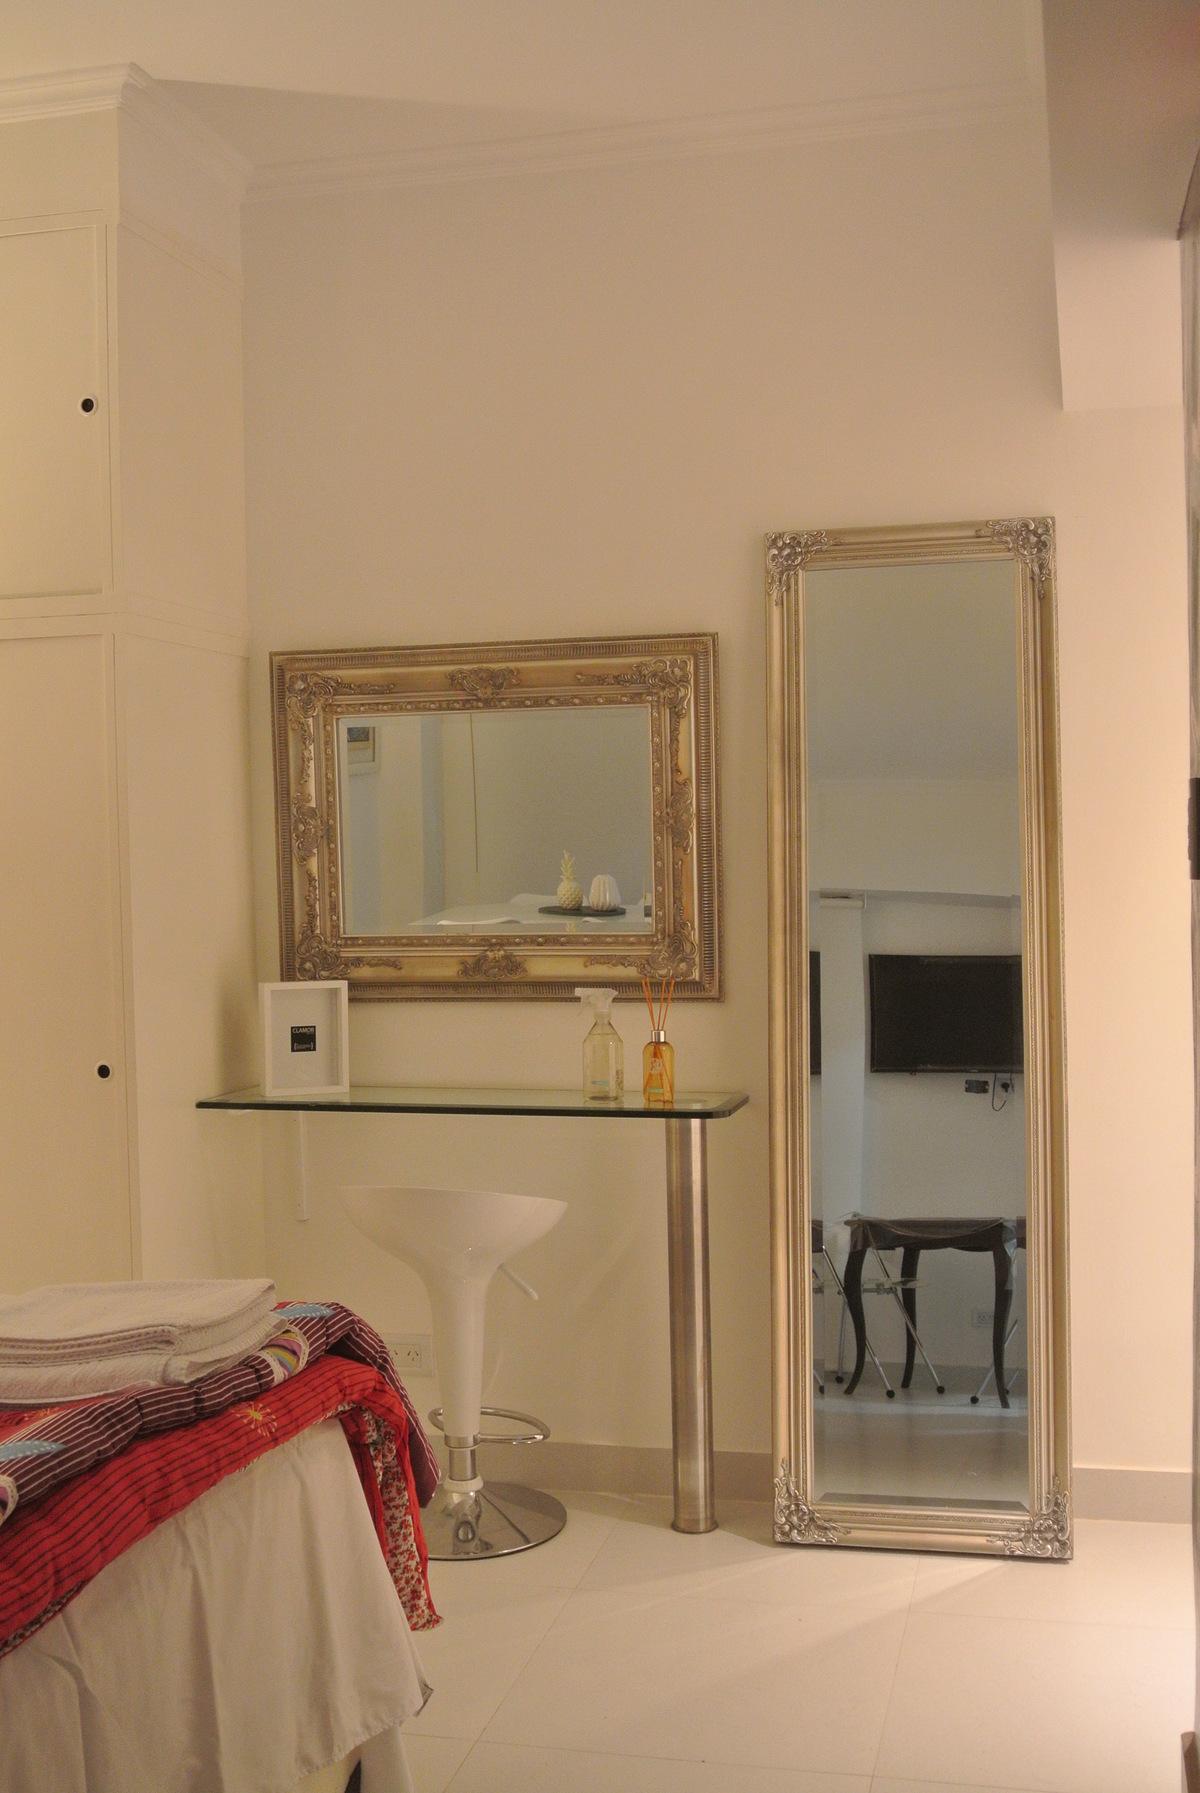 12 de 27: dressoir con espejos